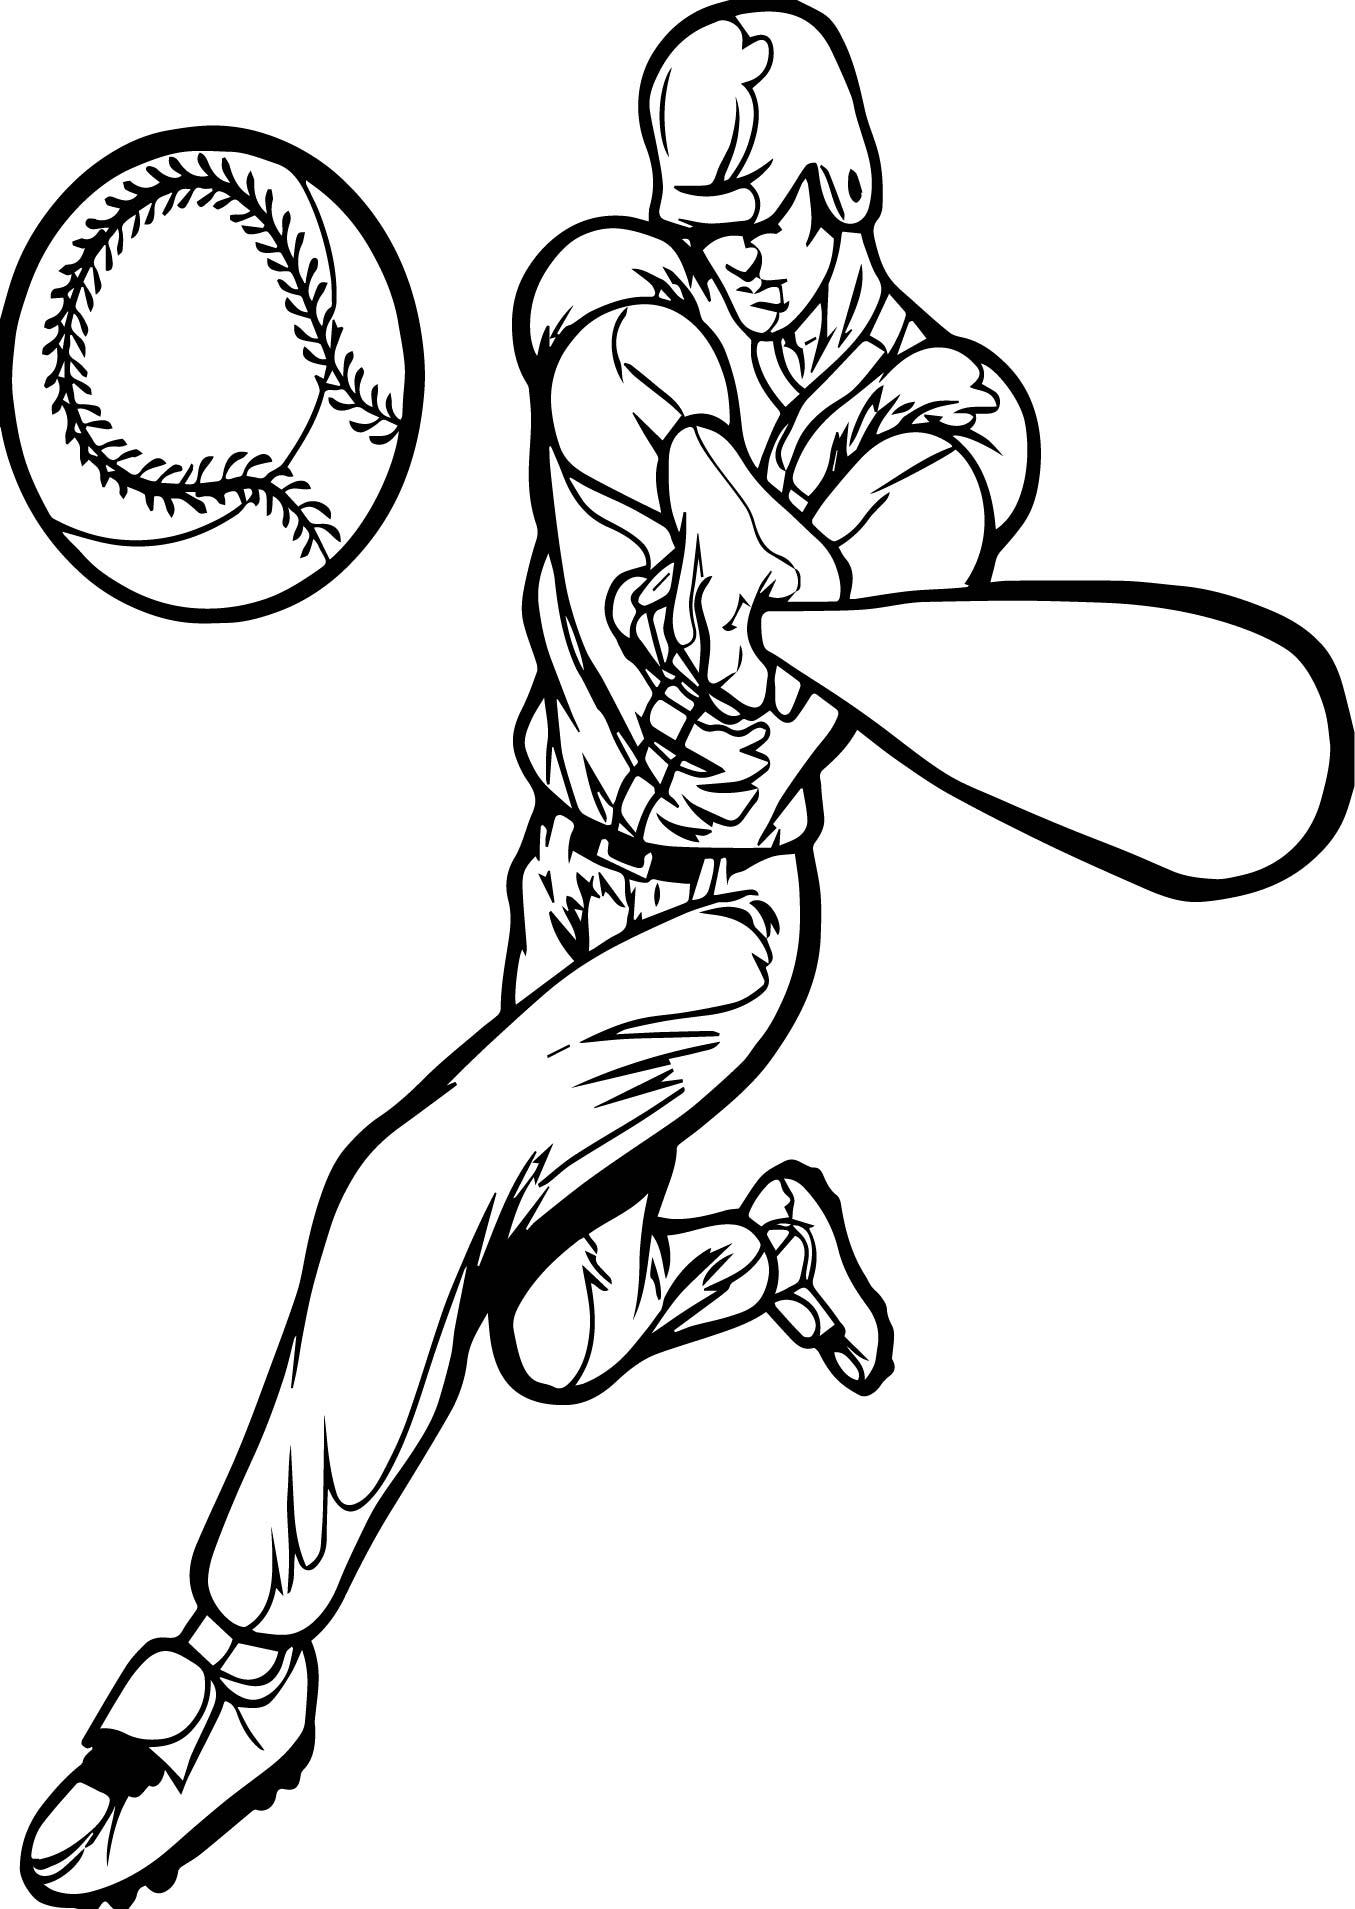 1355x1909 Baseball Pitcher Outline